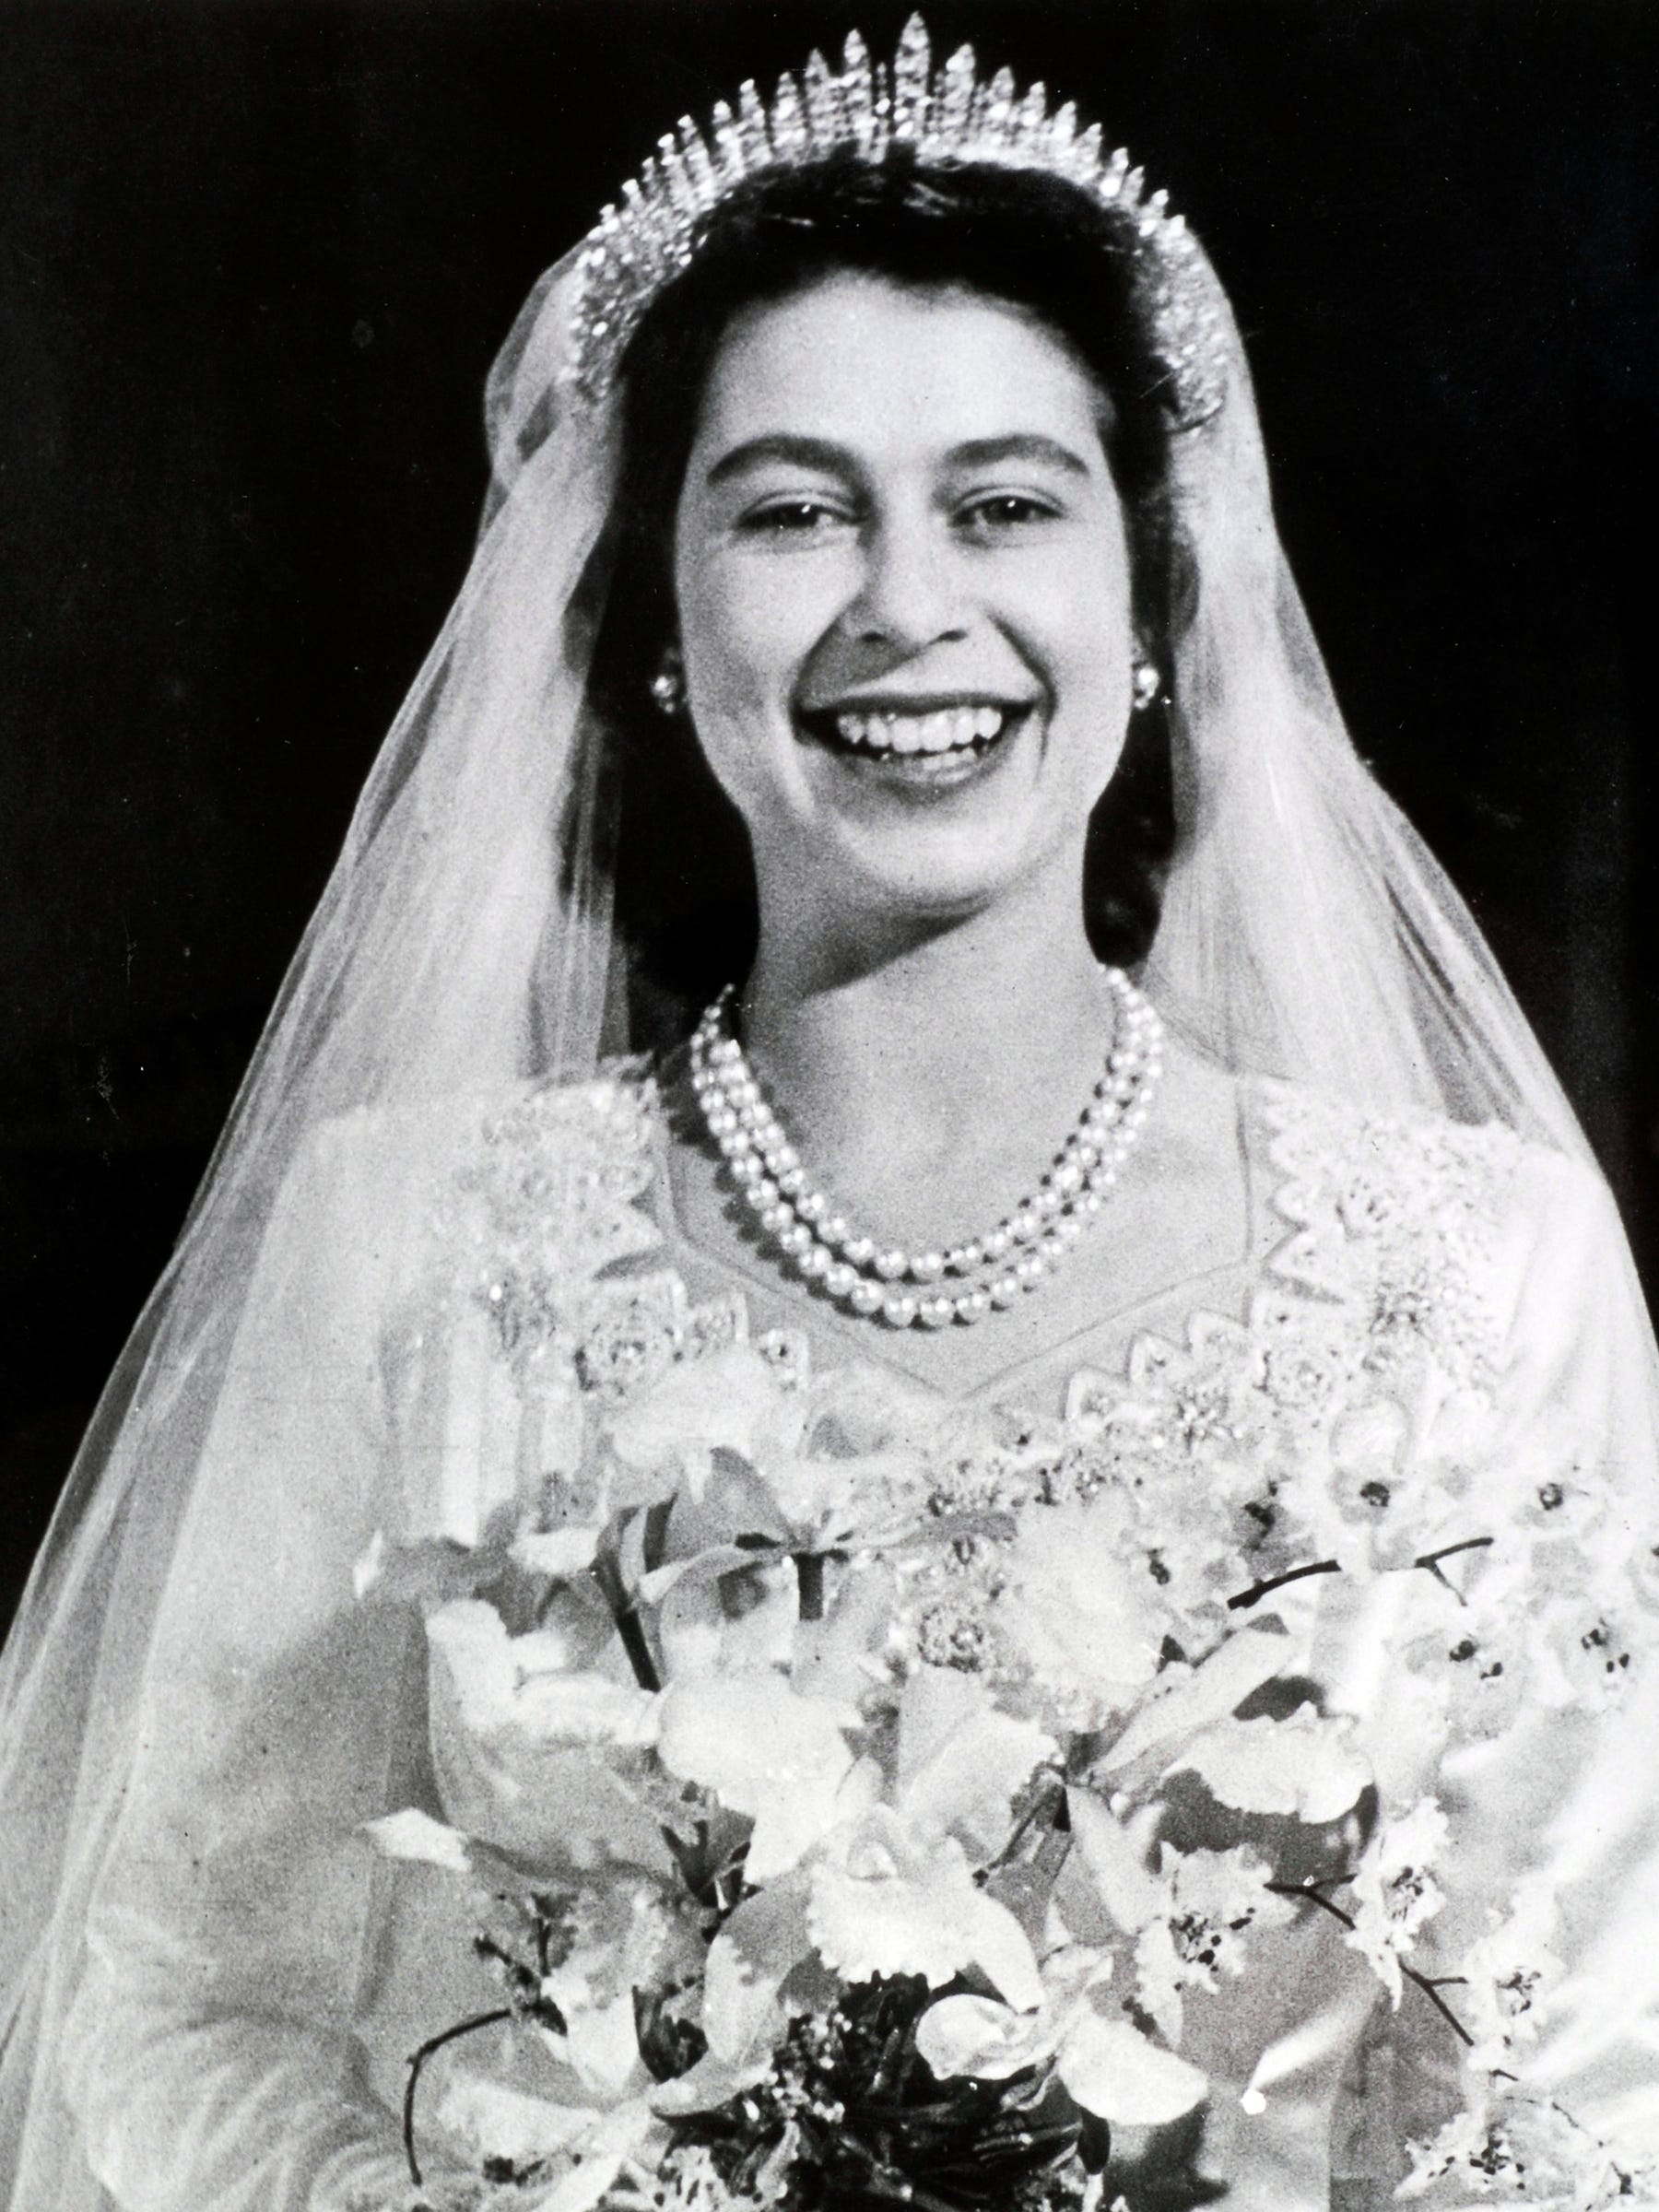 Queen Elizabeth Wedding Tiara Engagement Ring - History